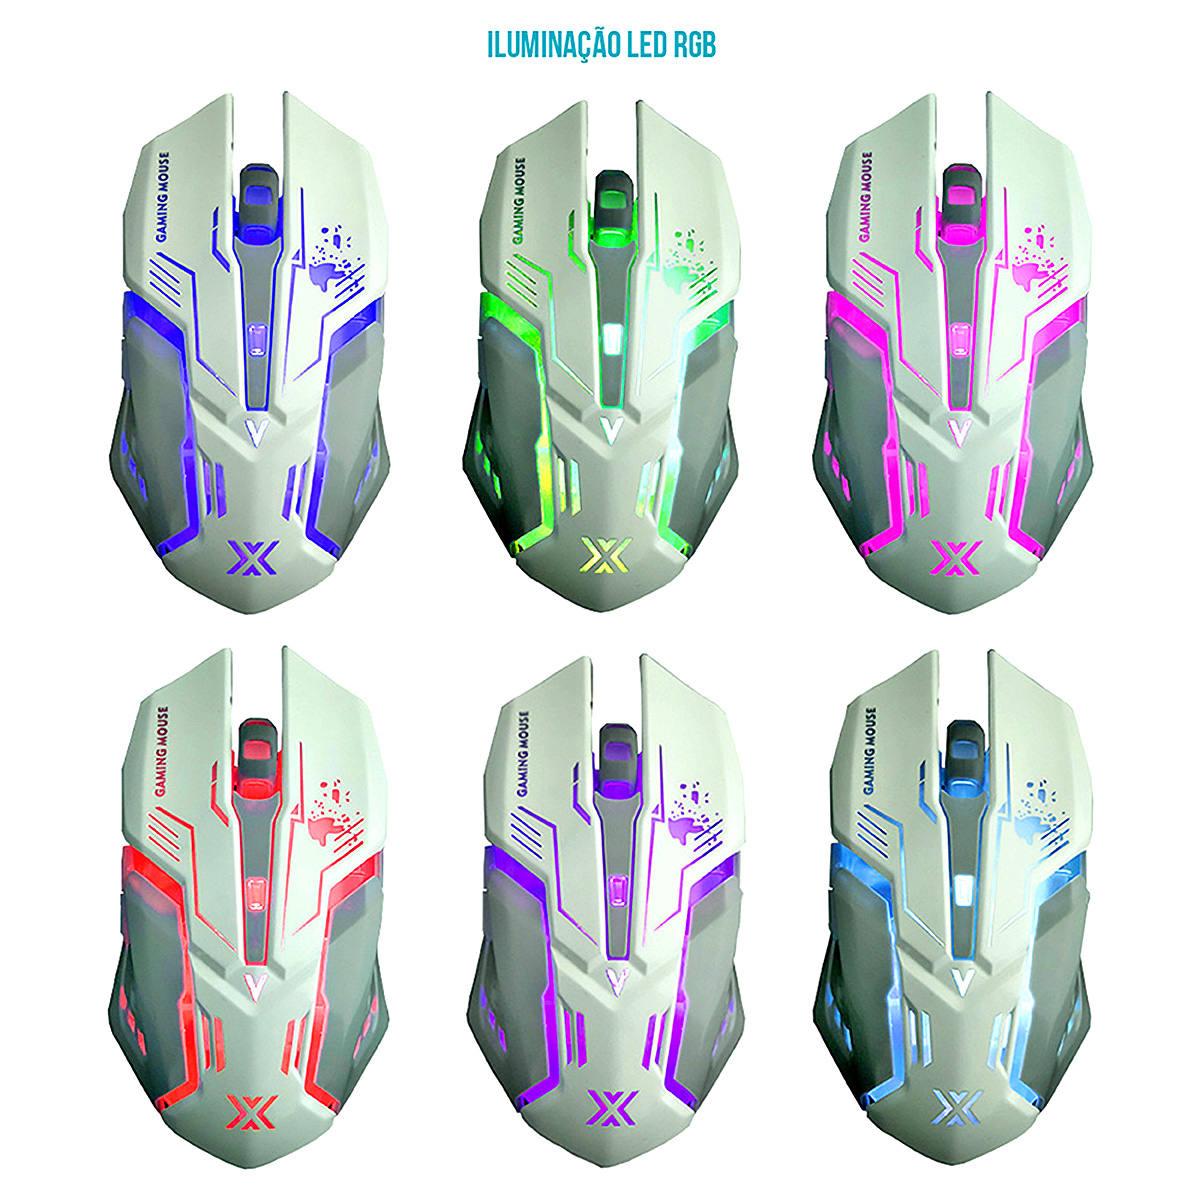 Mouse Gamer USB 3200dpi Iluminação LED RGB 6D X Soldado Infokit GM-600 Branco